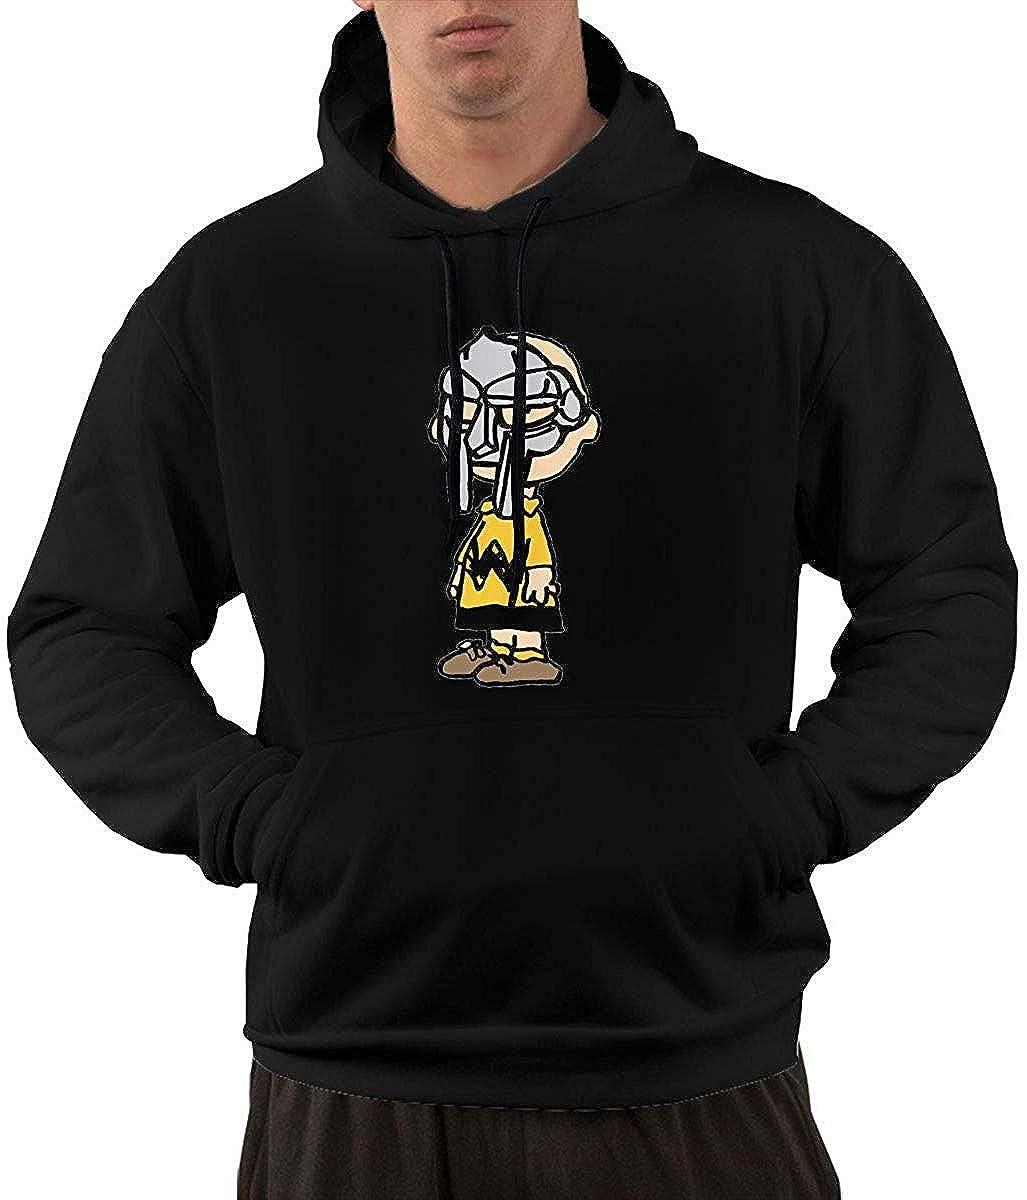 NALLK-7A Sudadera con Capucha para Hombre - Charlie Brown MF Doom ...